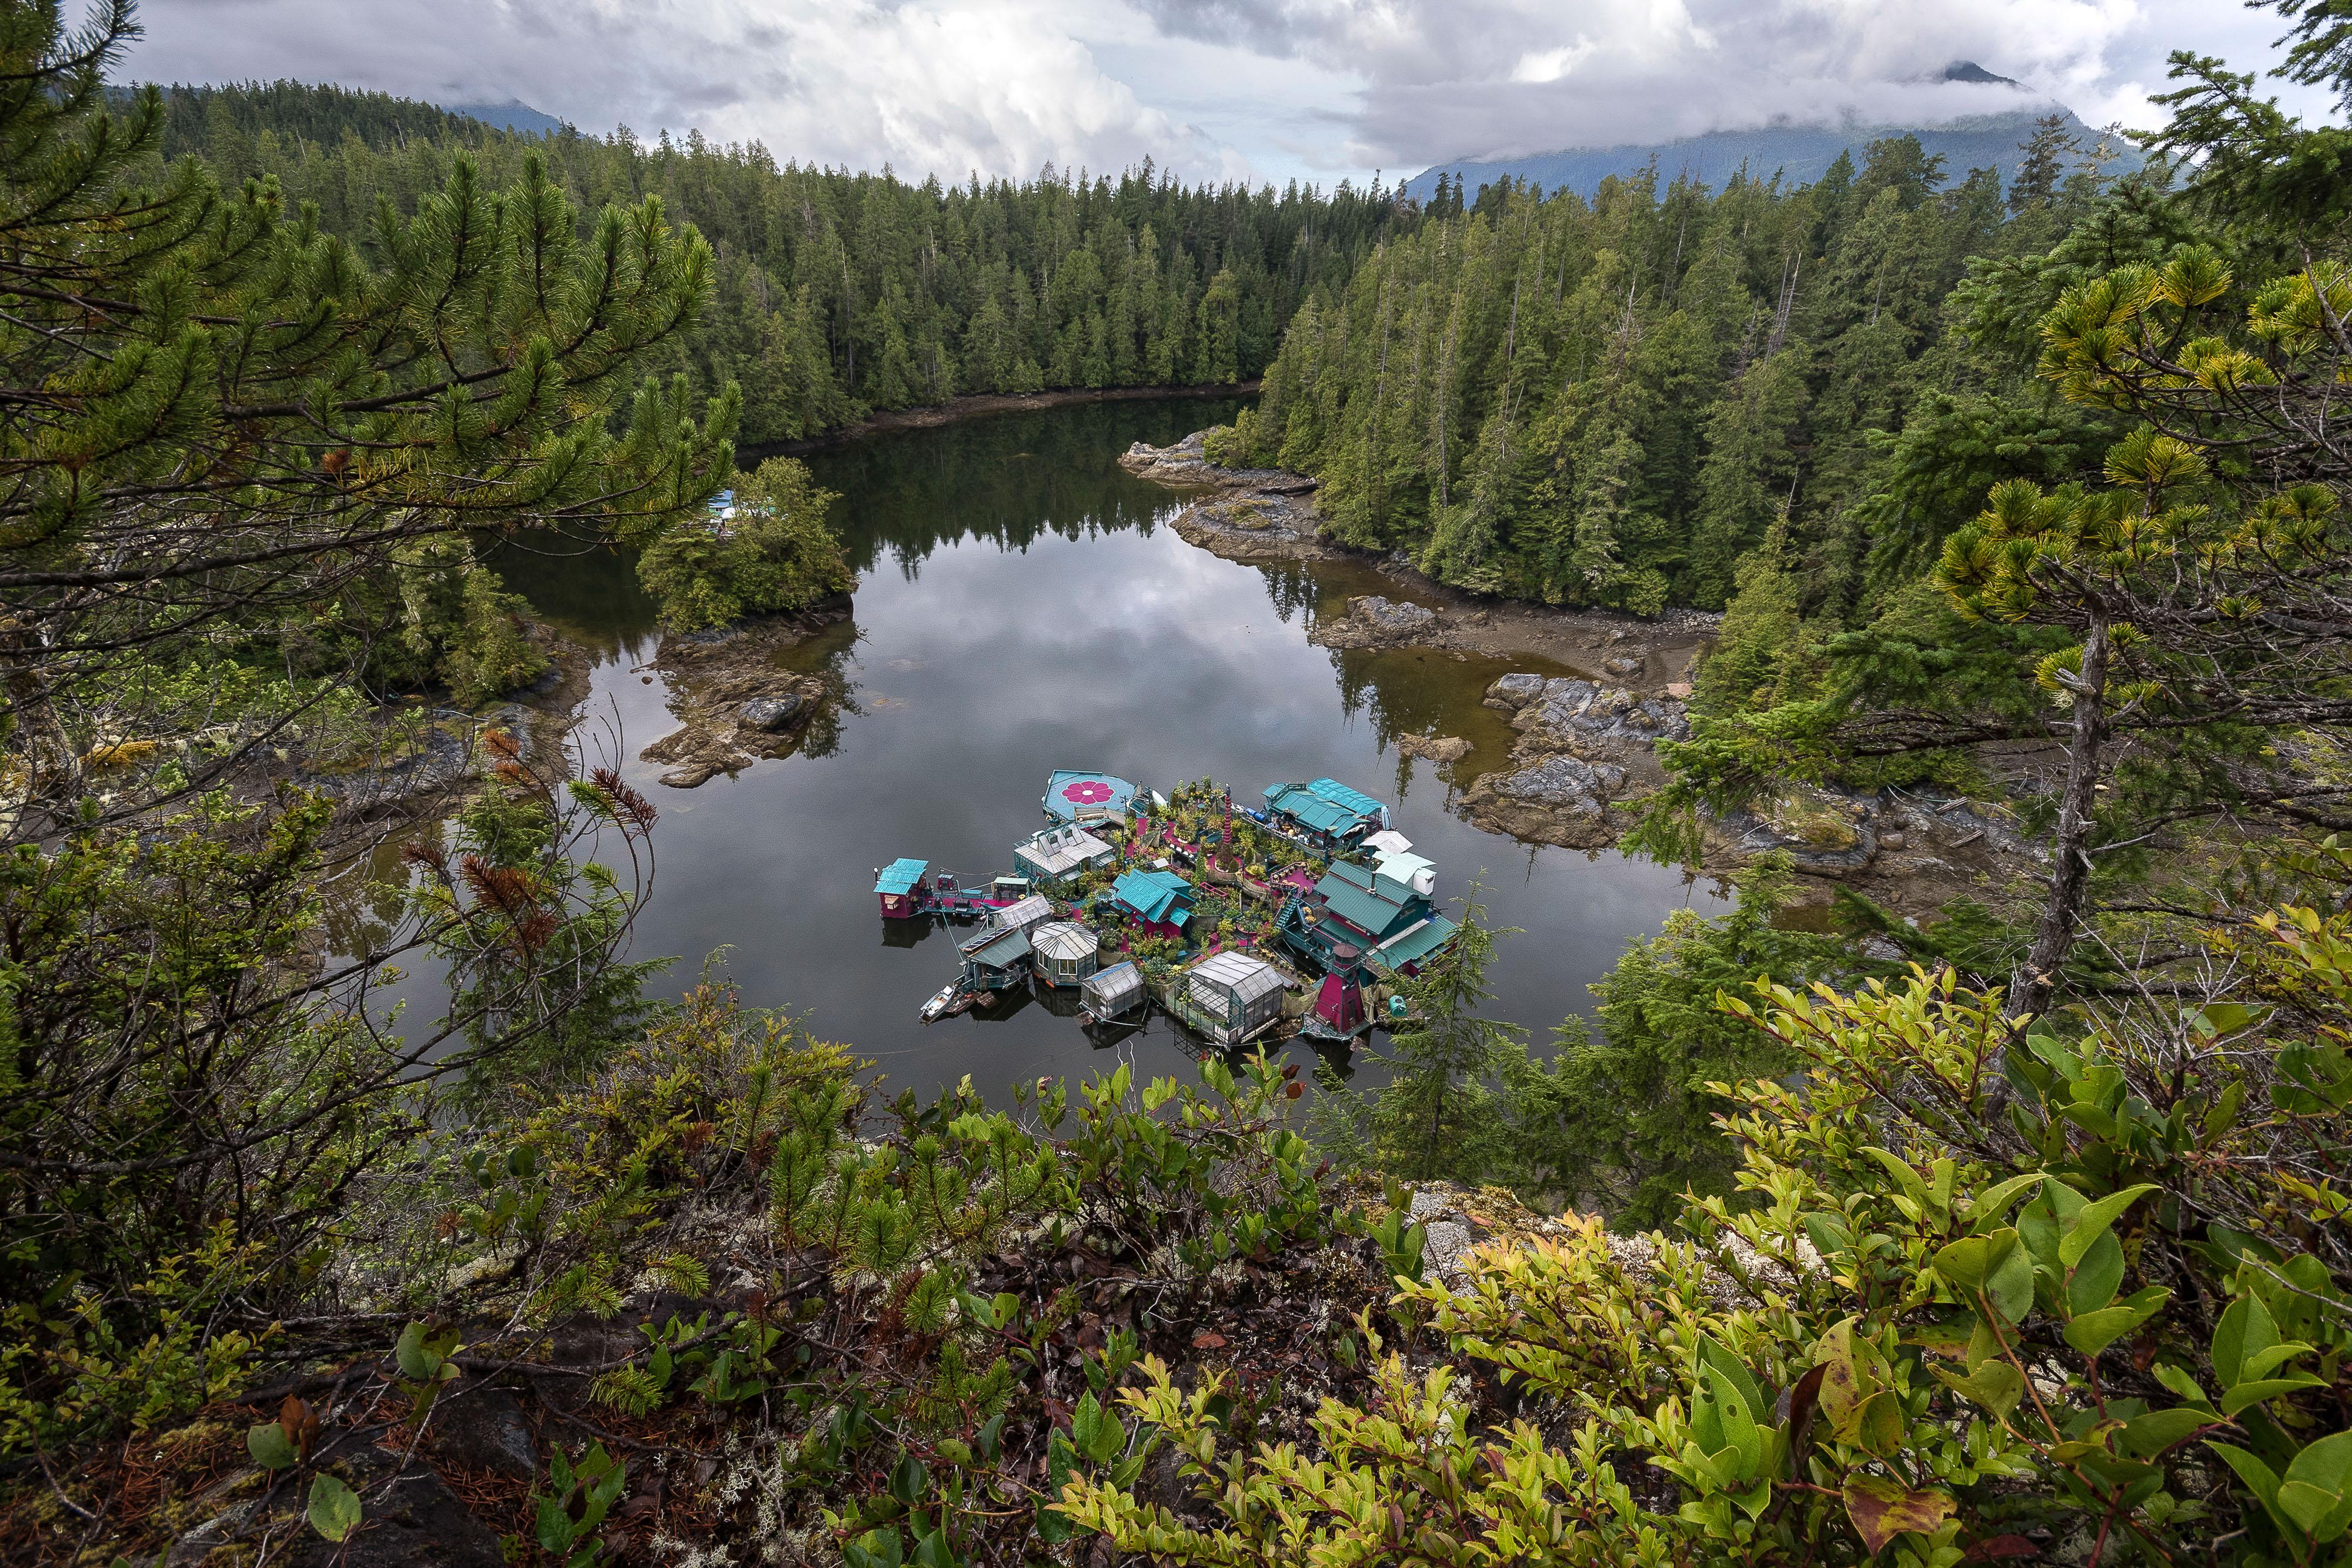 Utopia_FreedomCove_Vancouver Island- Canada